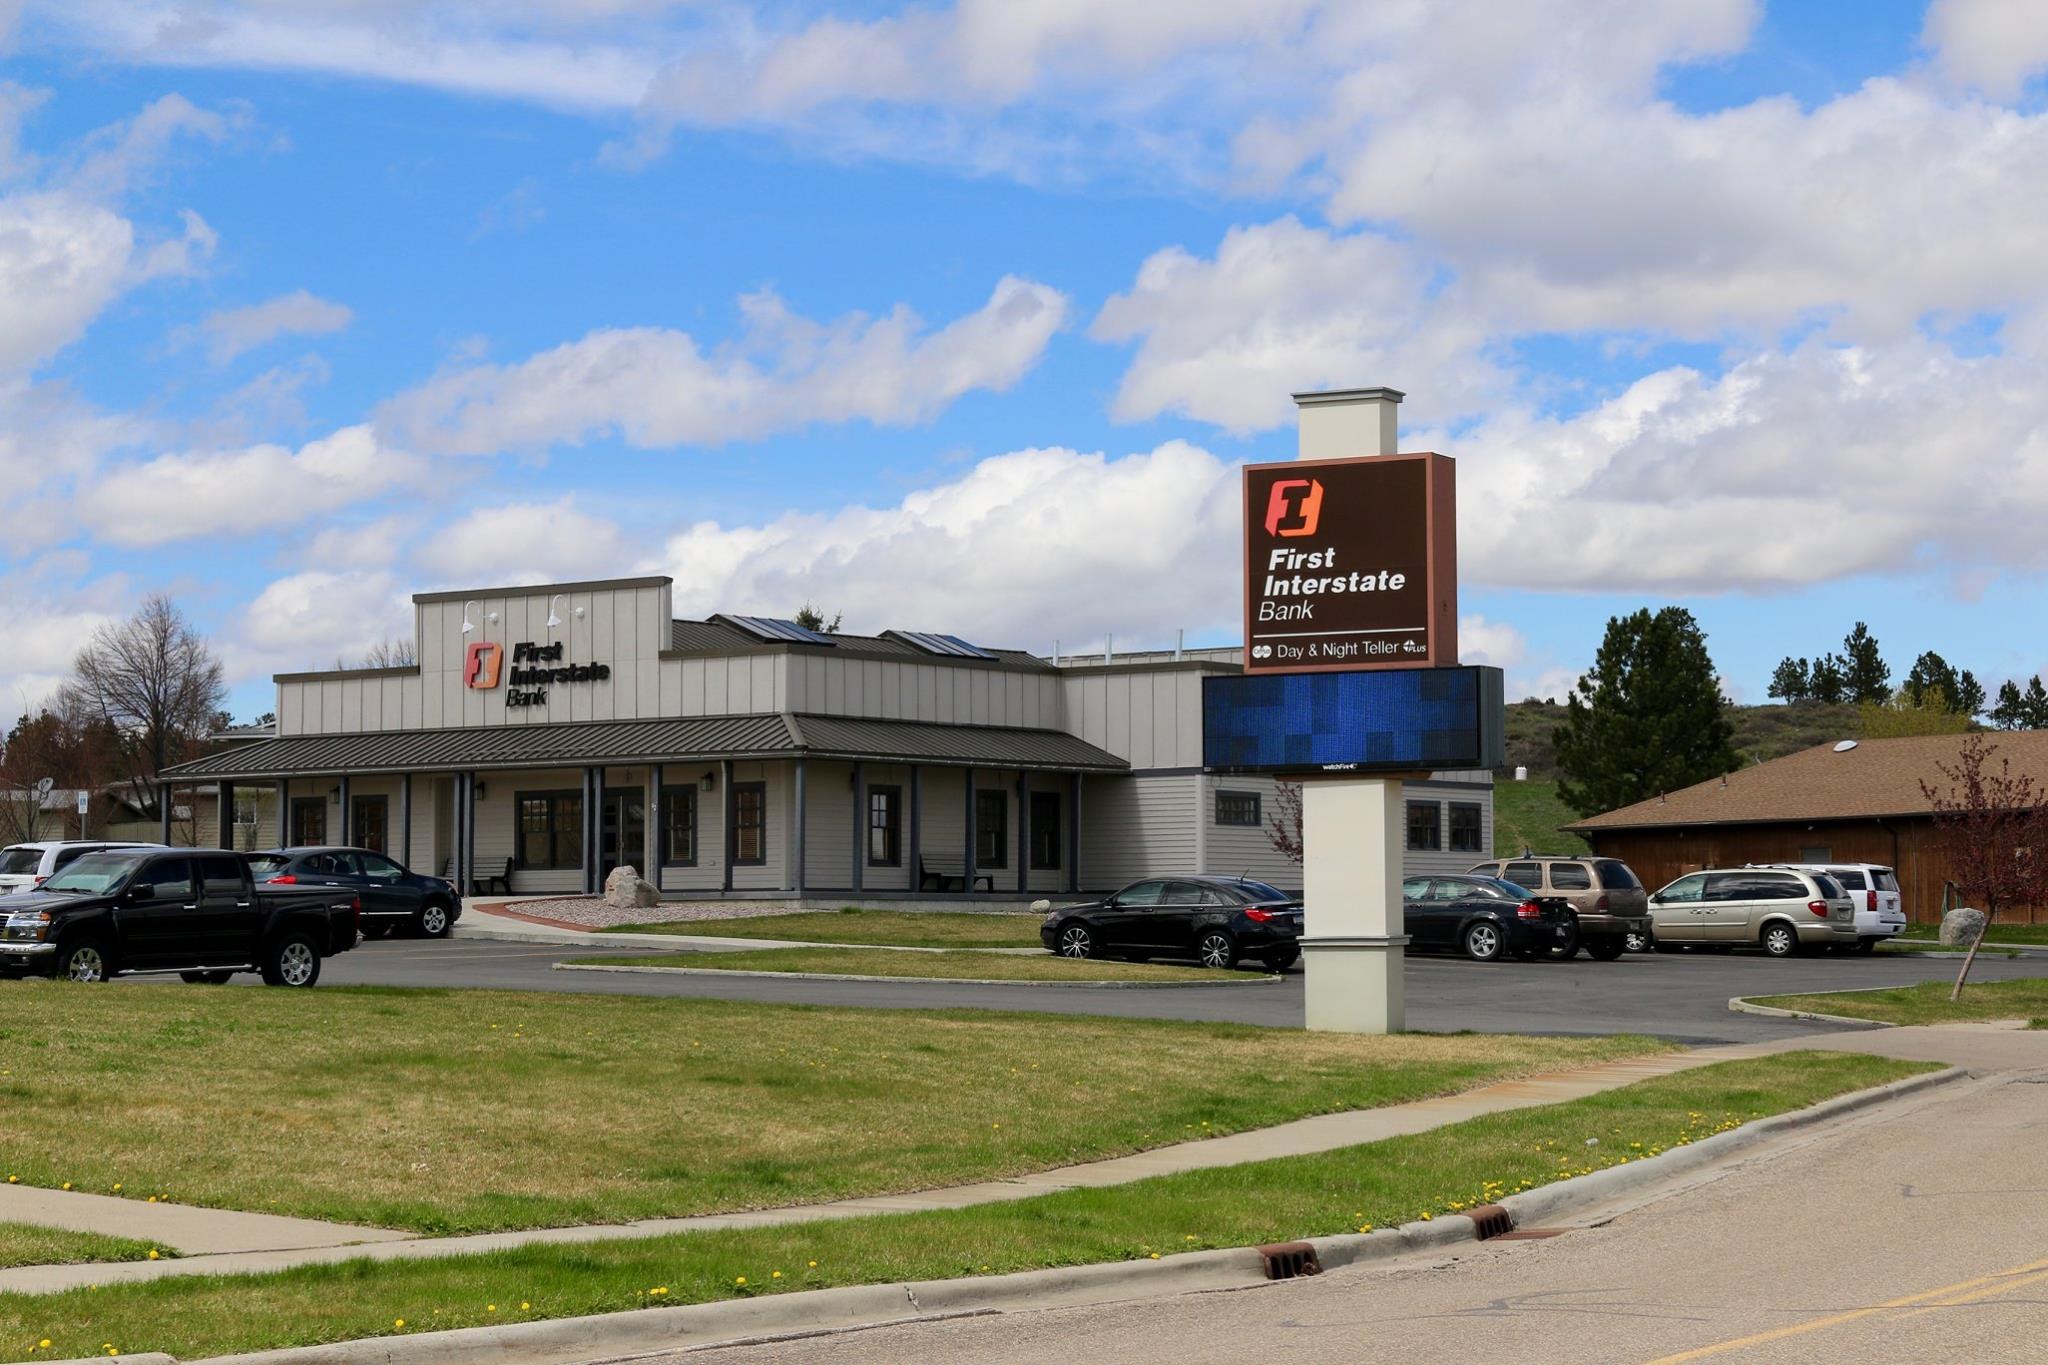 Local First Interstate Bank